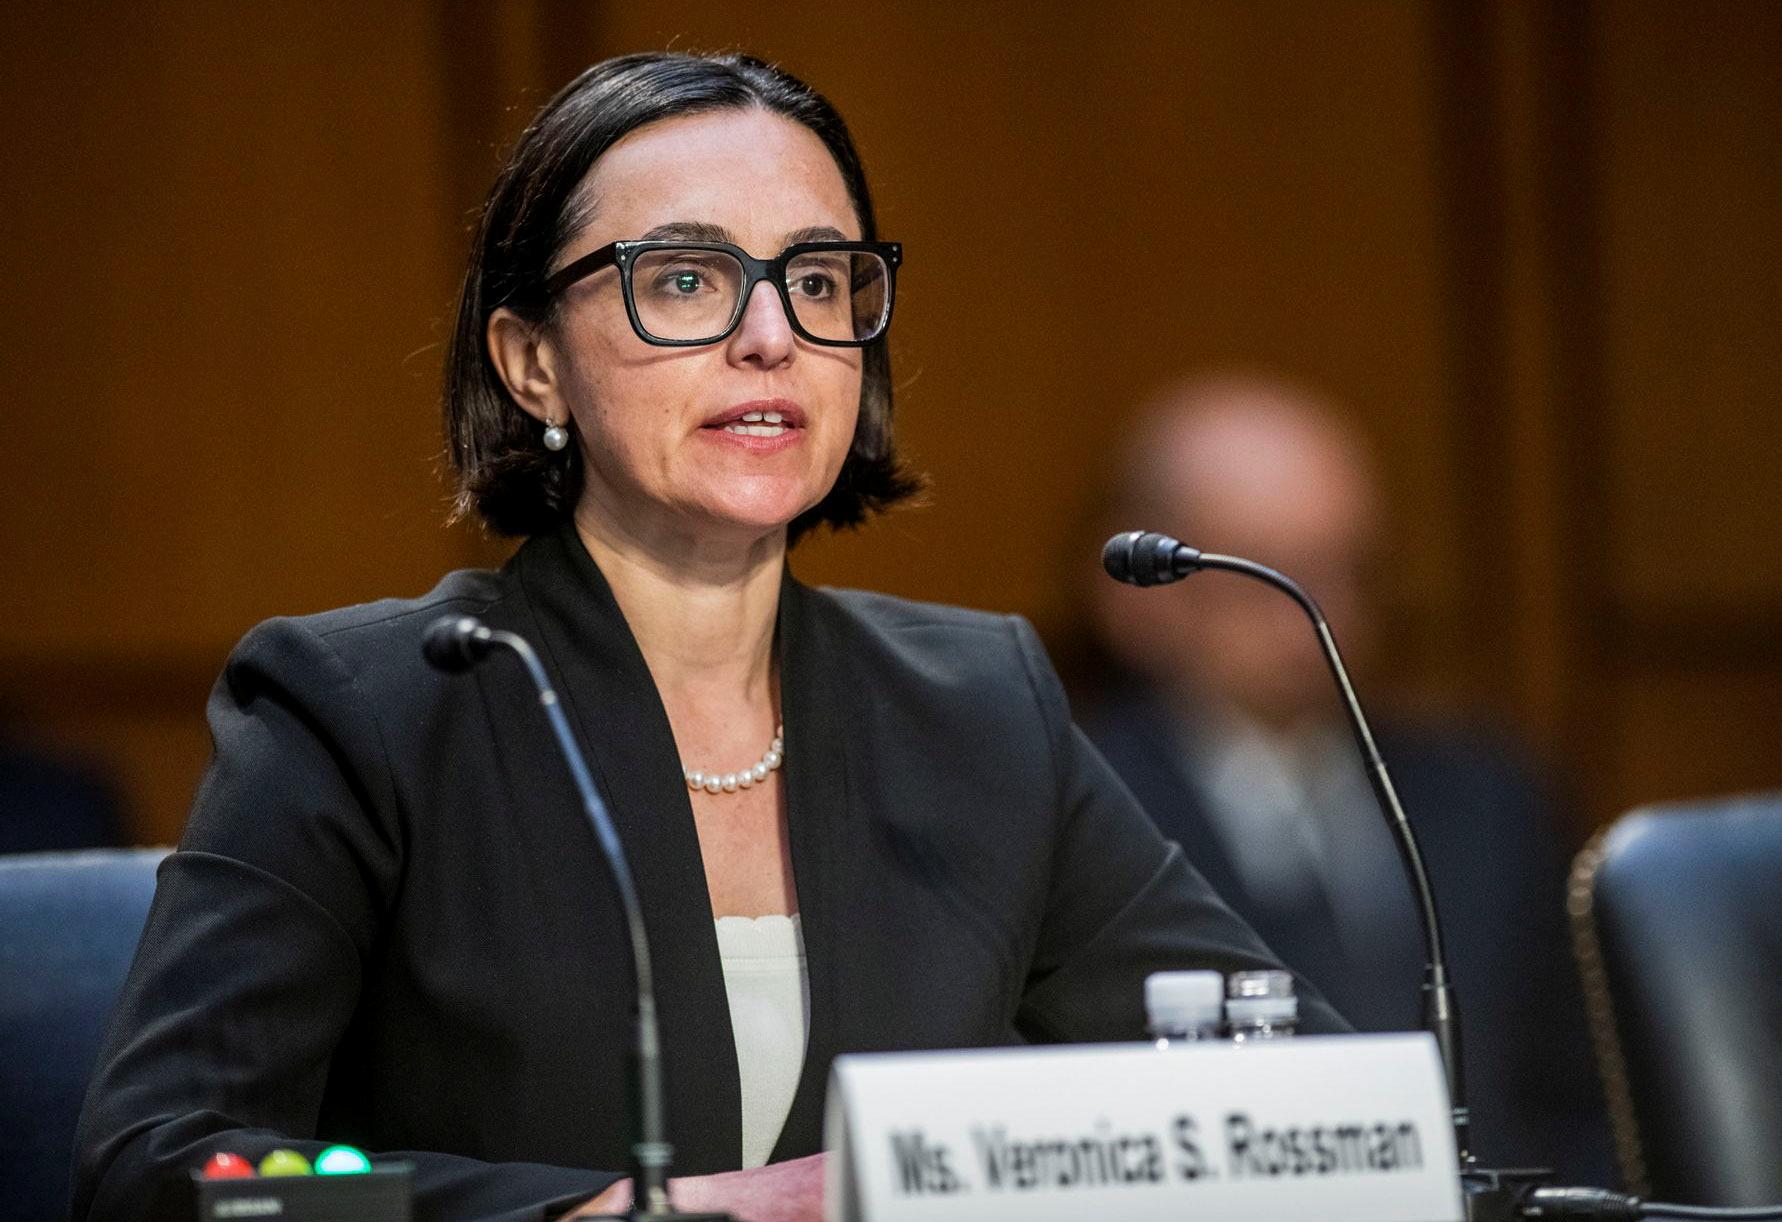 Veronica Rossman, nominated to a seat on the 10th U.S. Circuit Court of Appeals, testifies before a Senate hearing in Washington, June 9, 2021. David Rogowski/U.S. Senate/Handout via Reuters